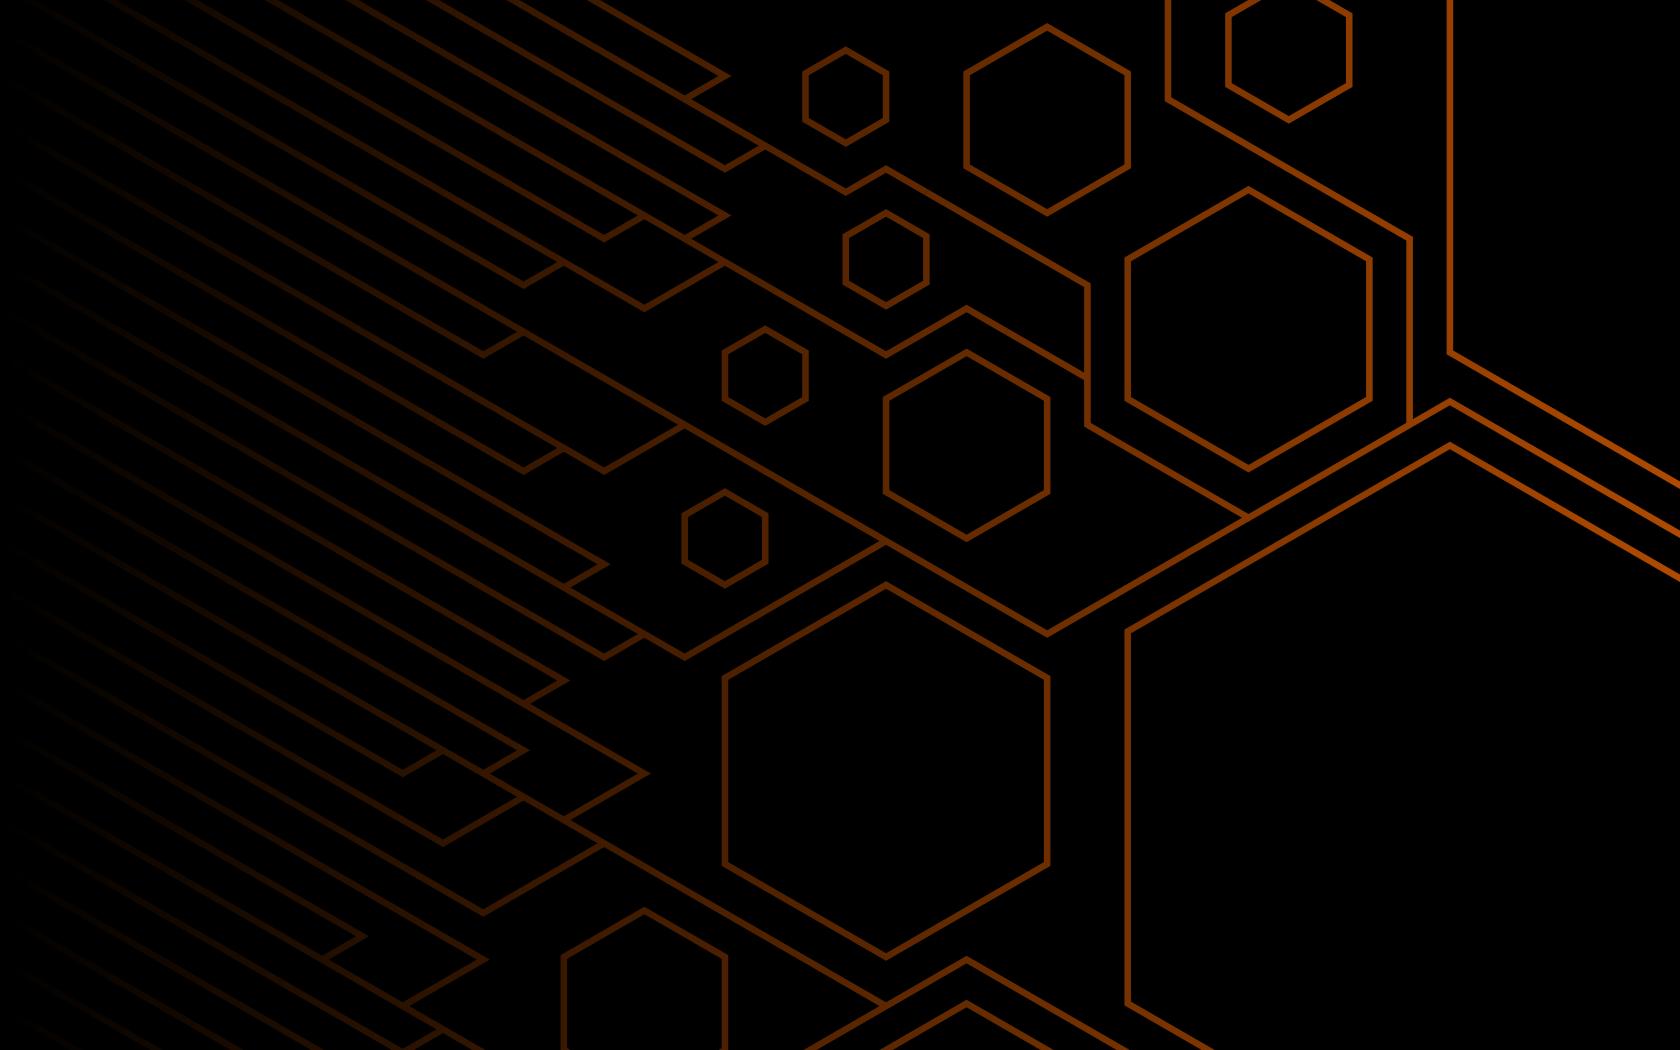 Orange Hexagons by flaming-tubesock